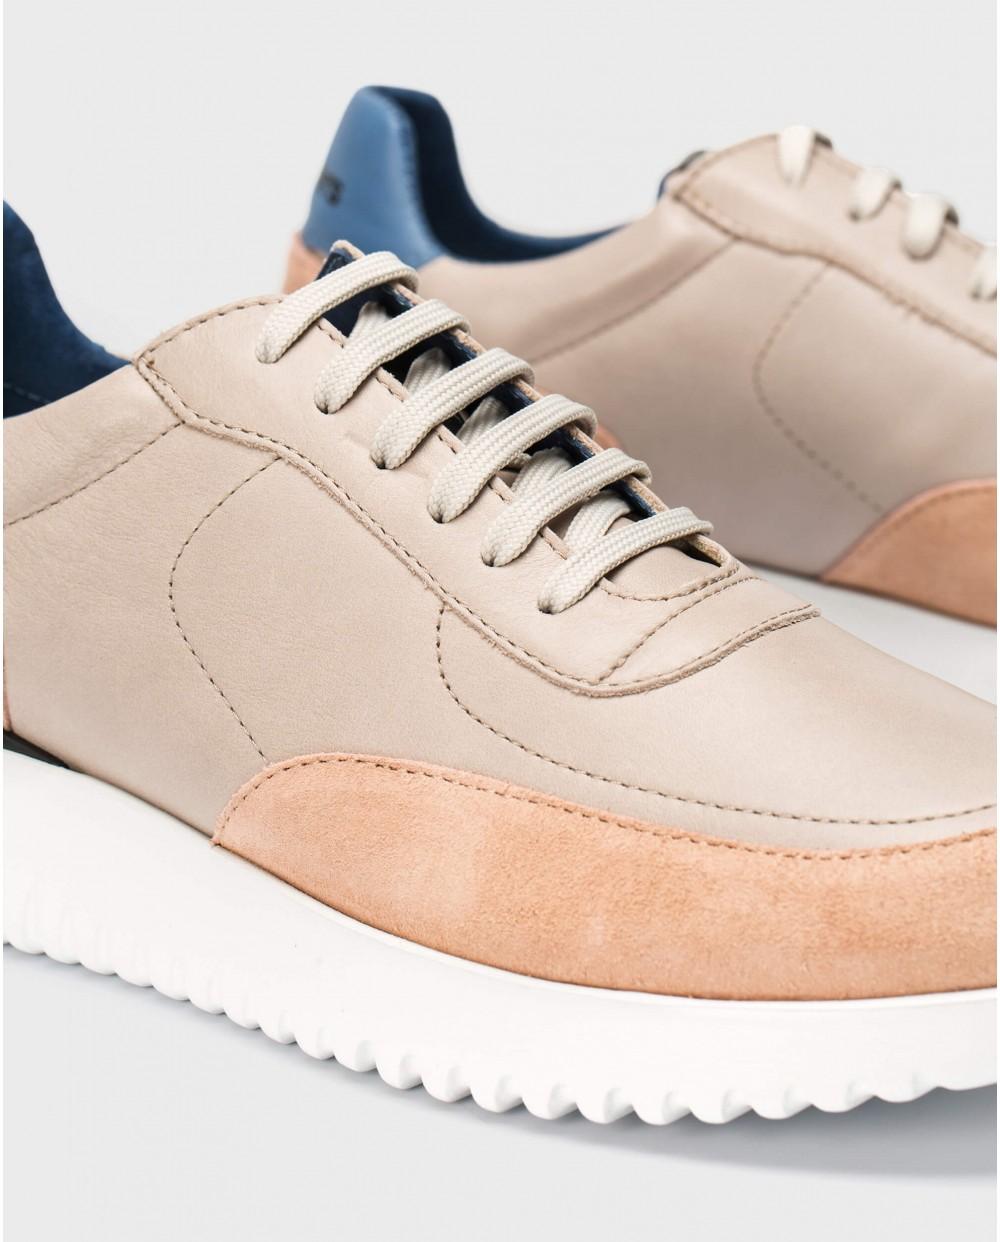 Wonders-Sneakers-Leather sneaker with shoelaces